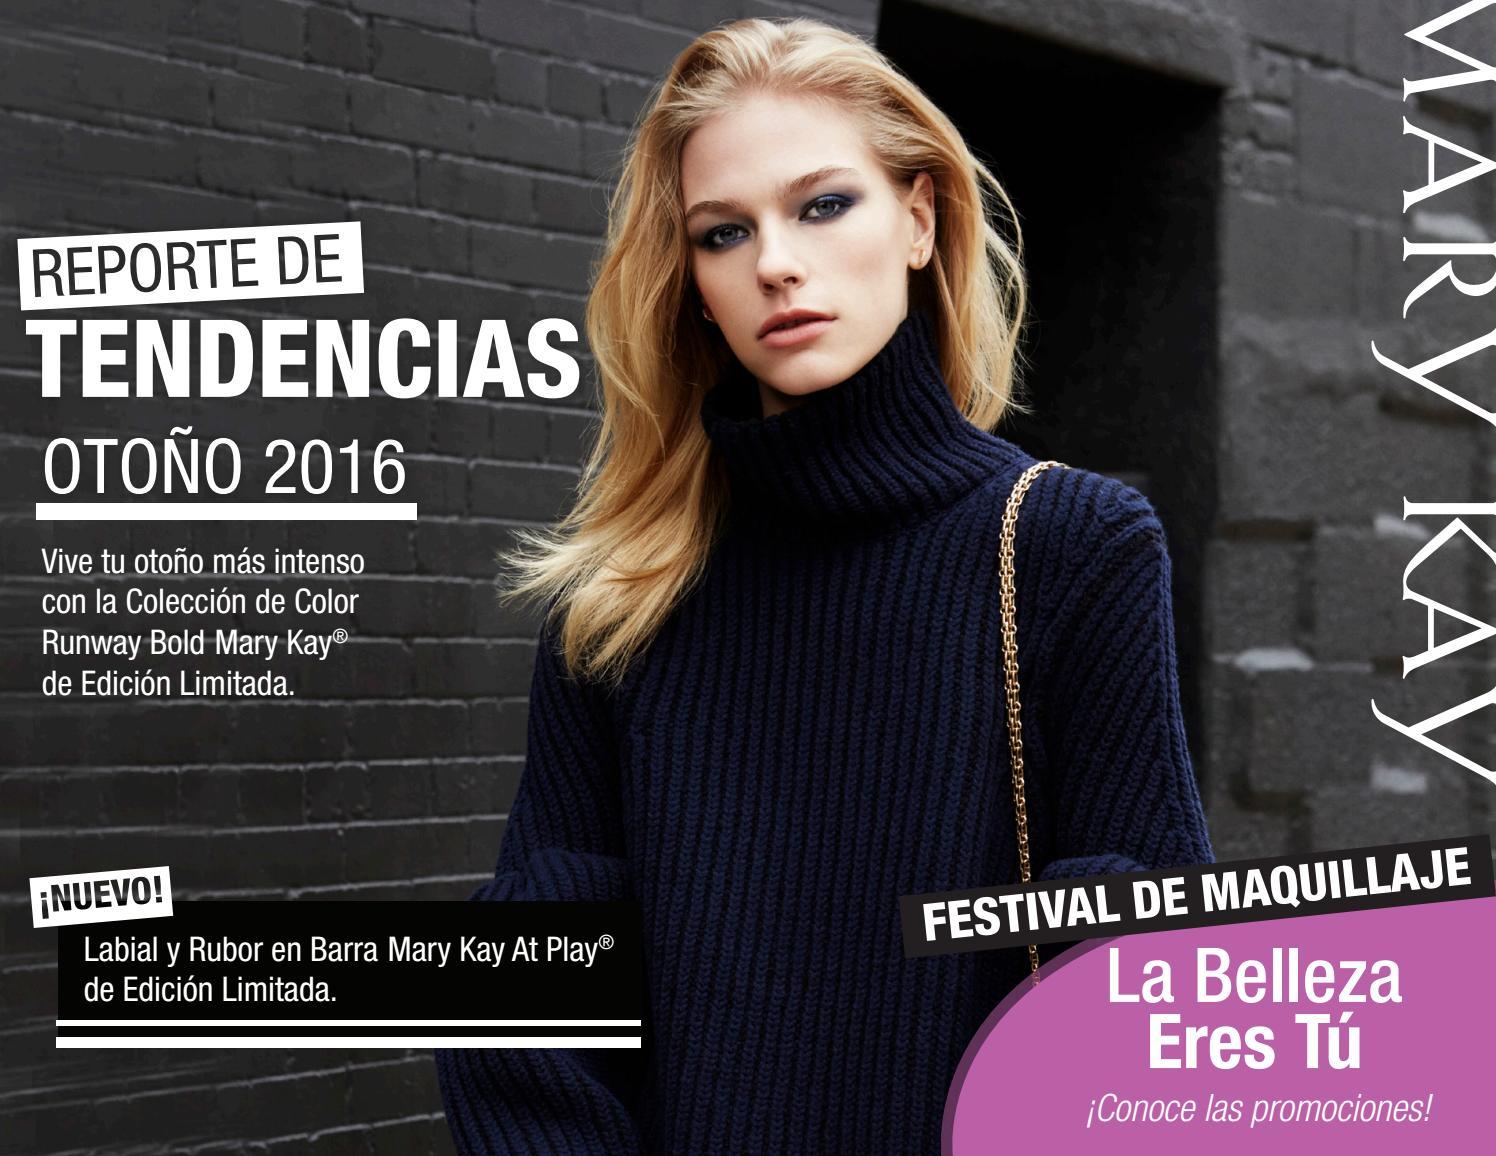 Reporte Mary Kay de Tendencias Septiembre Octubre 2016 by Mary Kay de México - Issuu